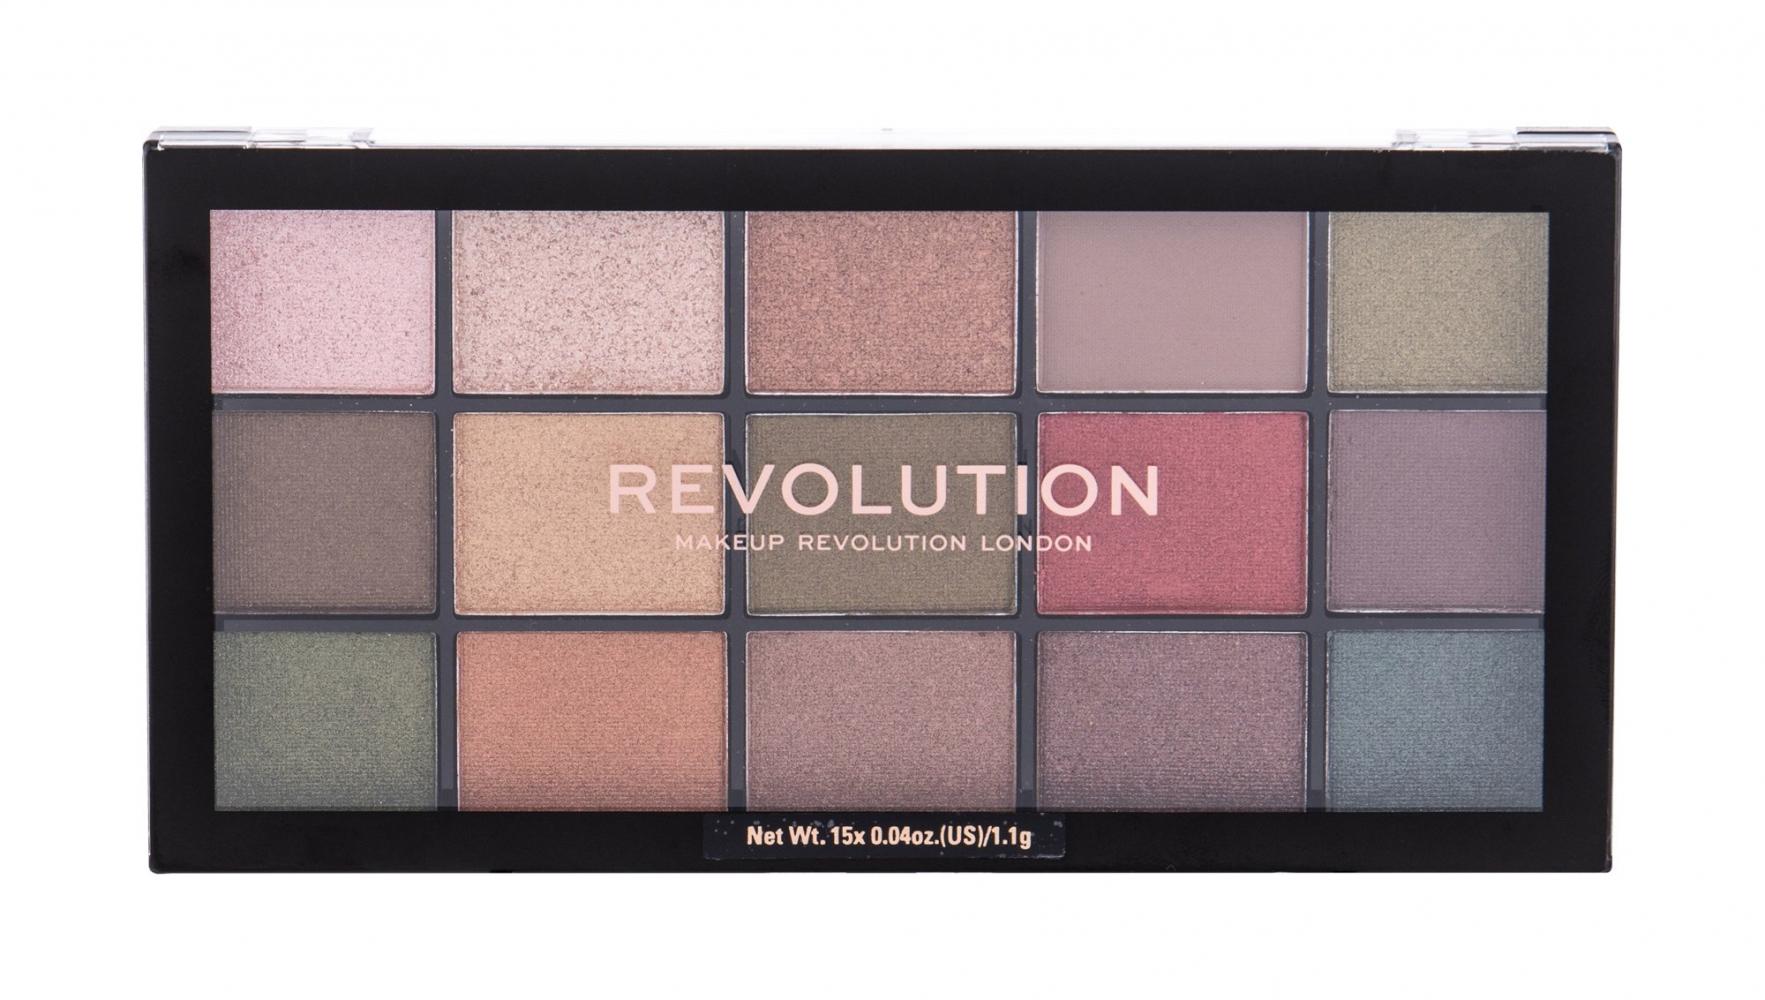 Mergi la Re-loaded - Makeup Revolution London - Fard de pleoape